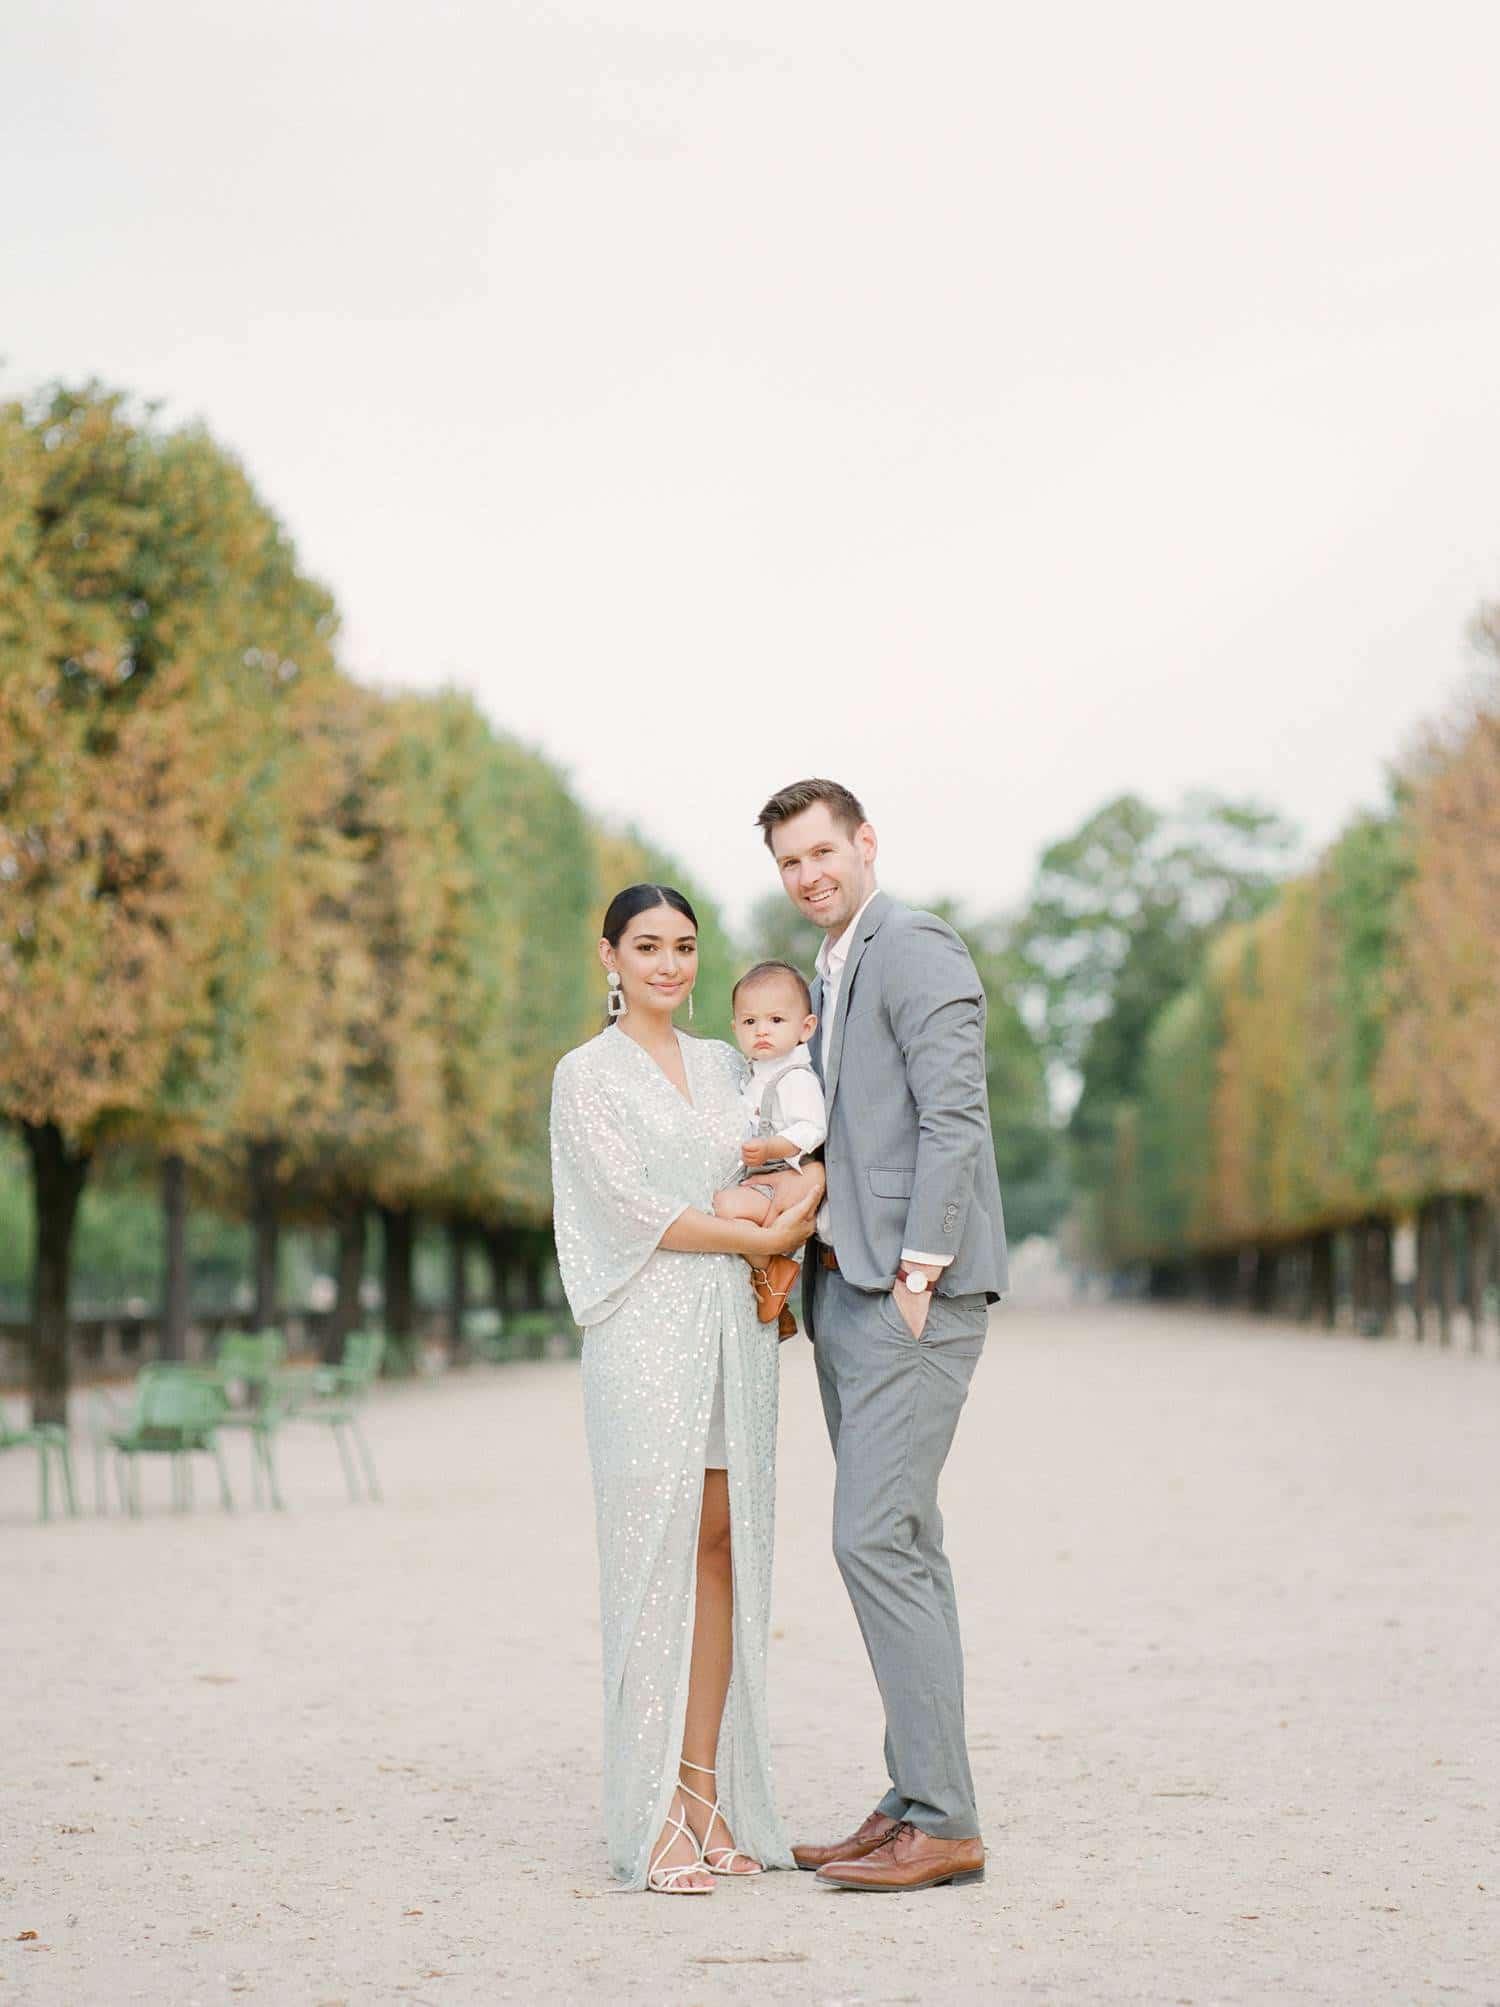 Paris family photos